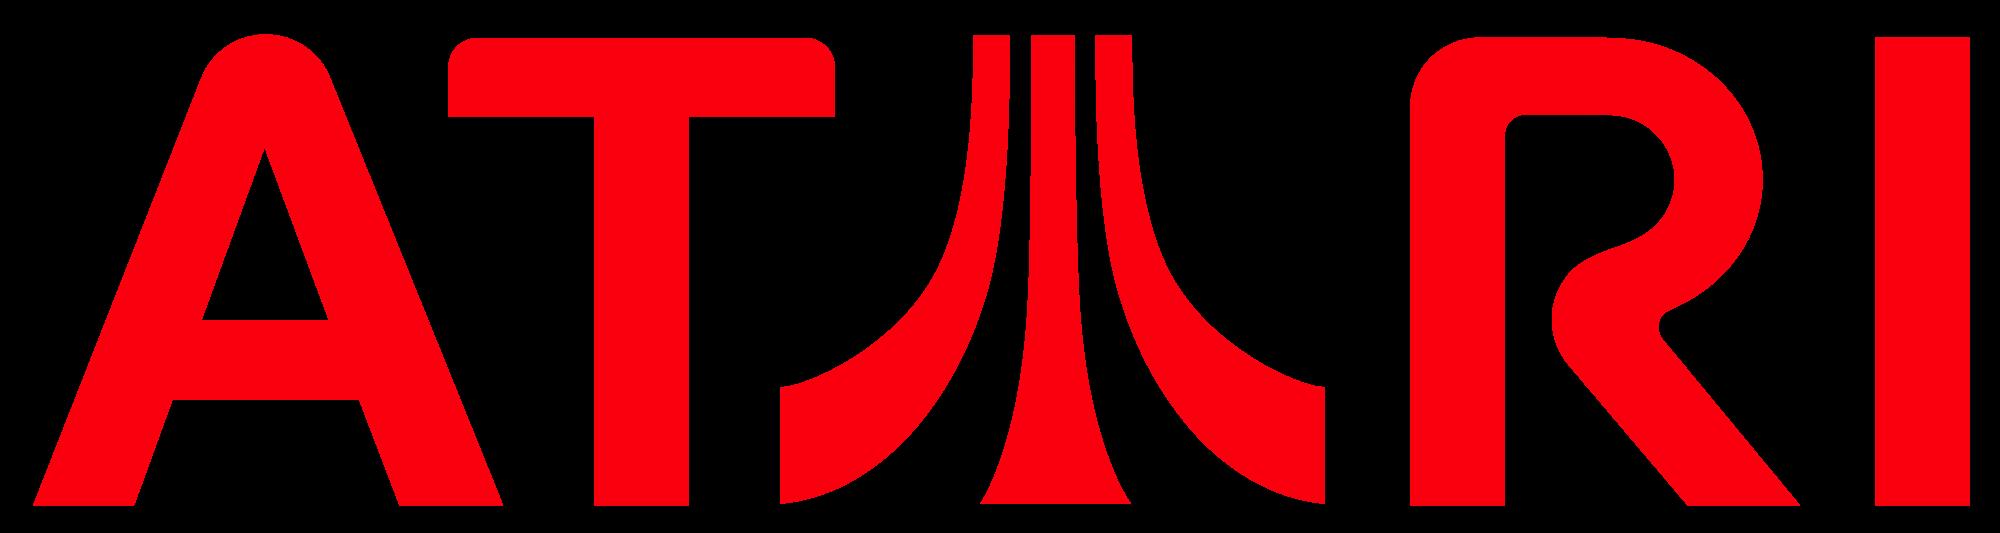 Atari Abstract Logotype